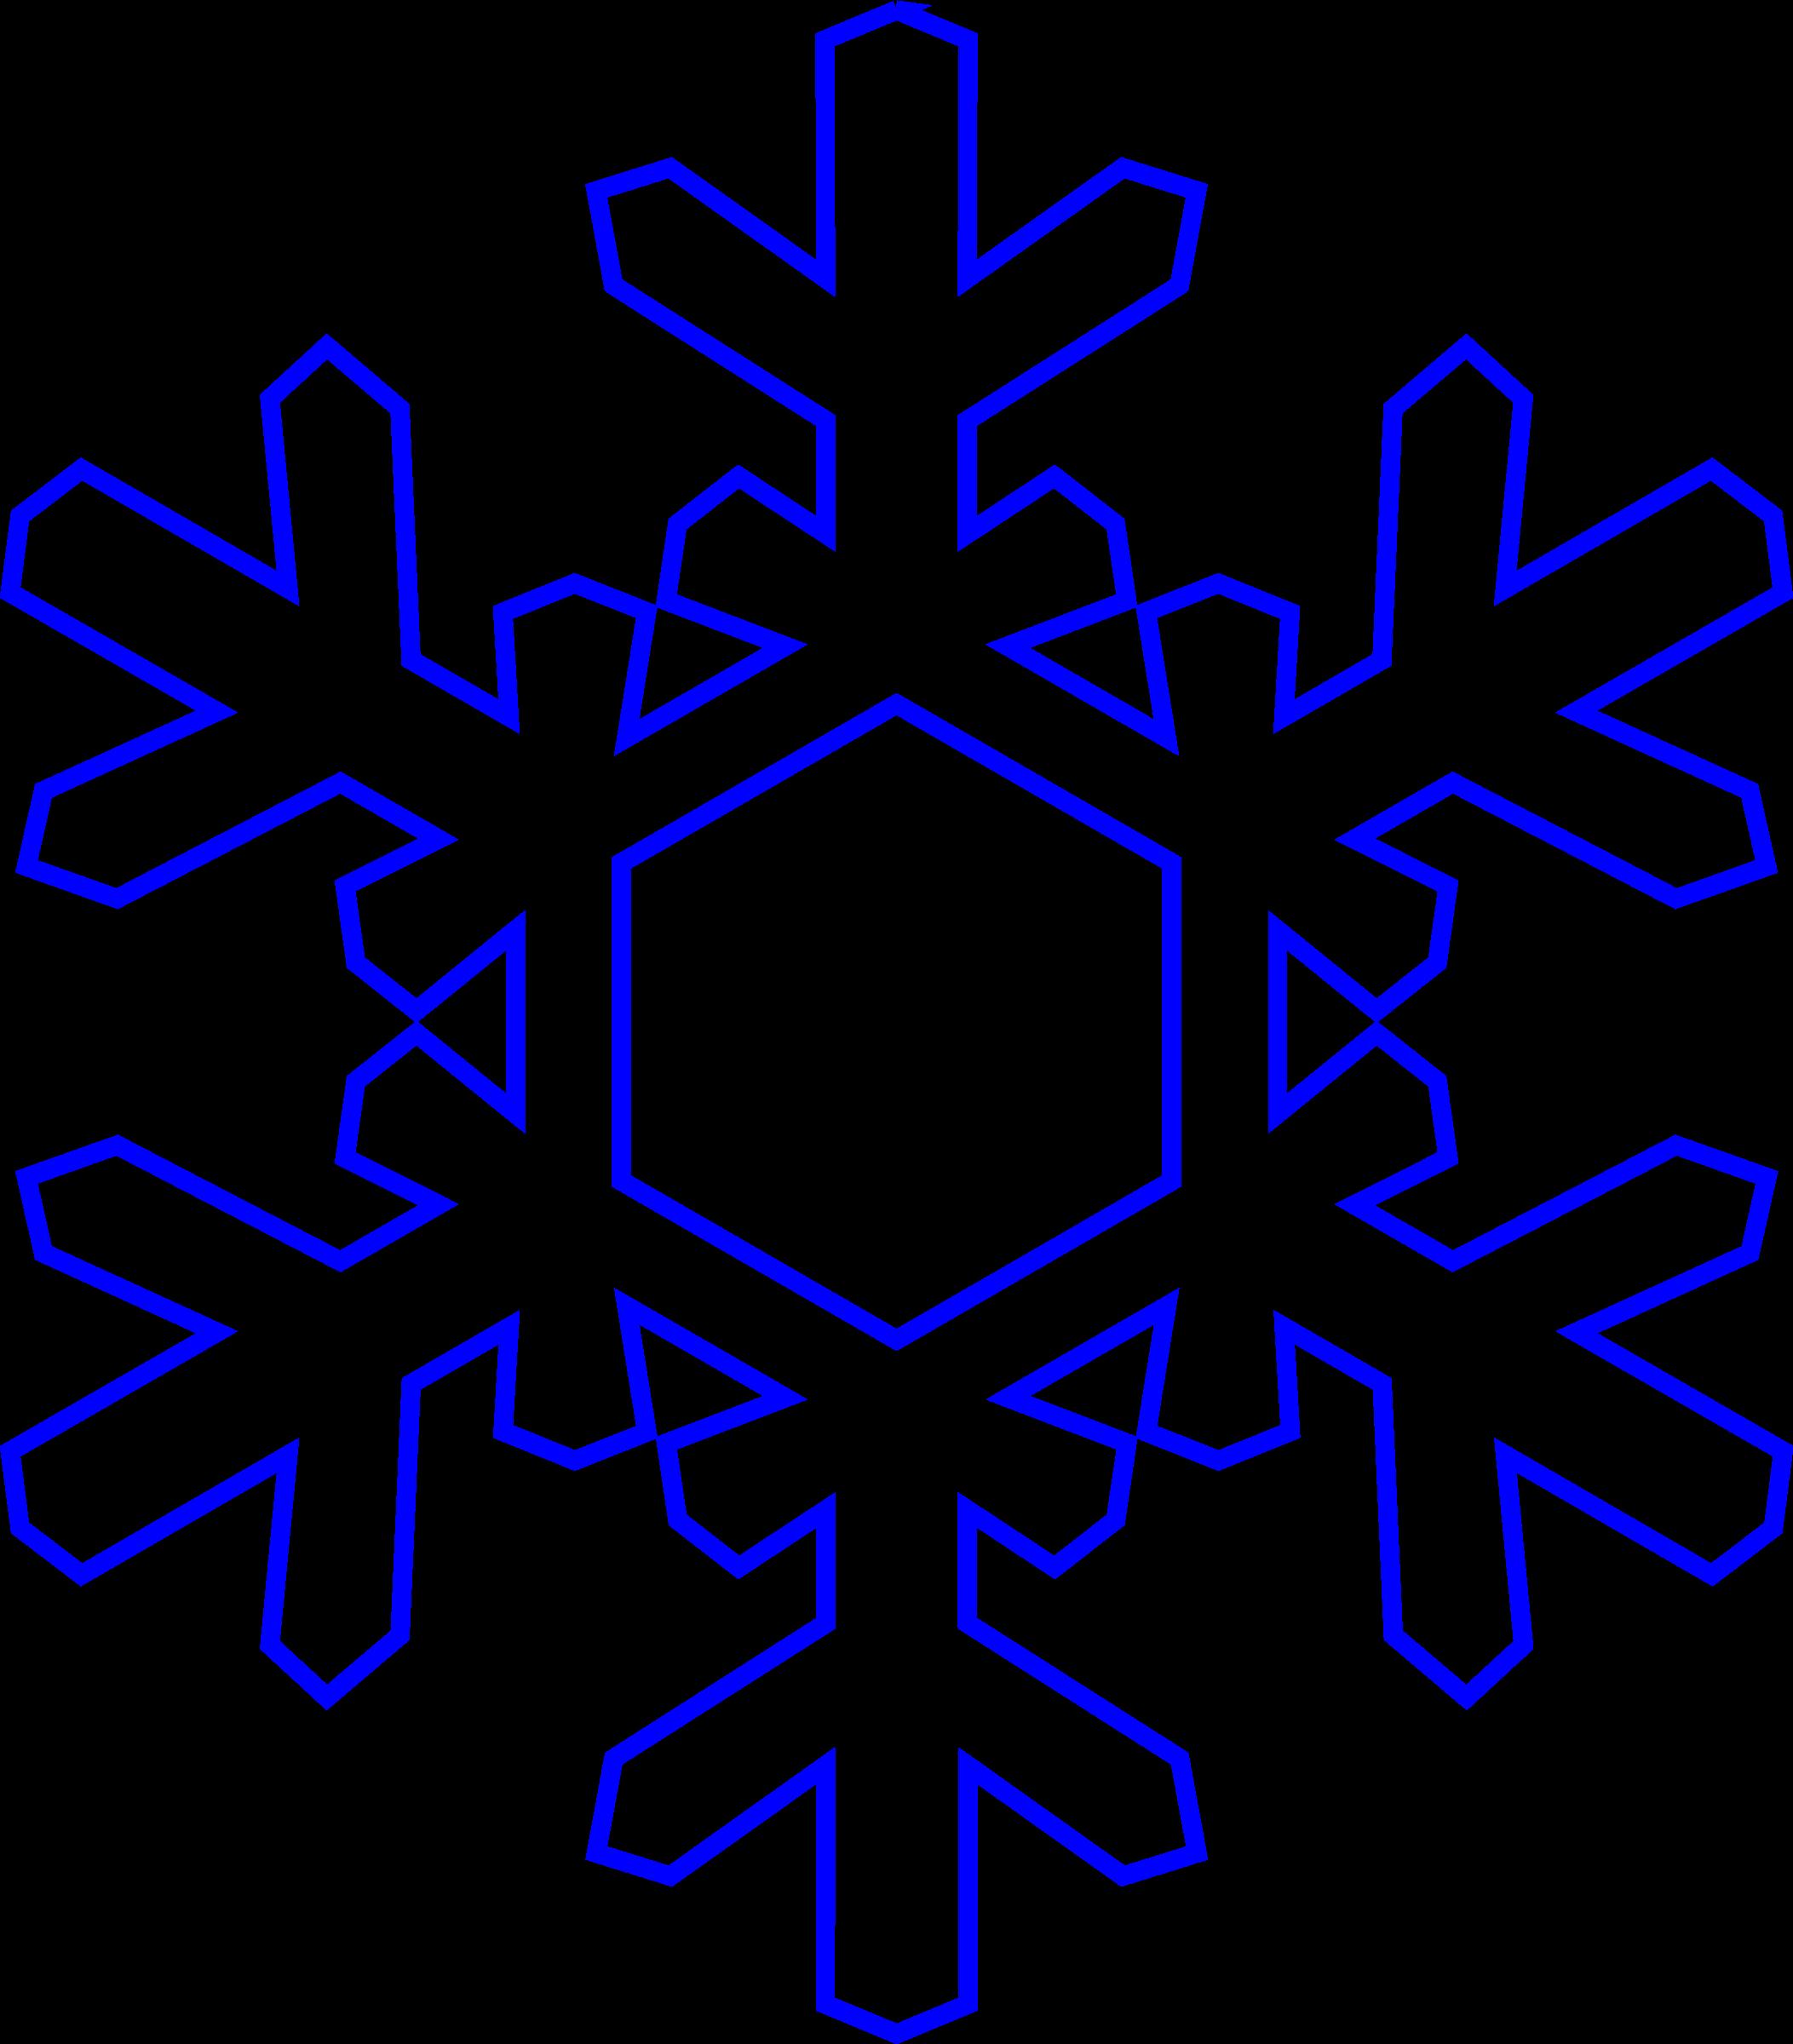 Real cliparts jokingart com. Crystal clipart black snowflake